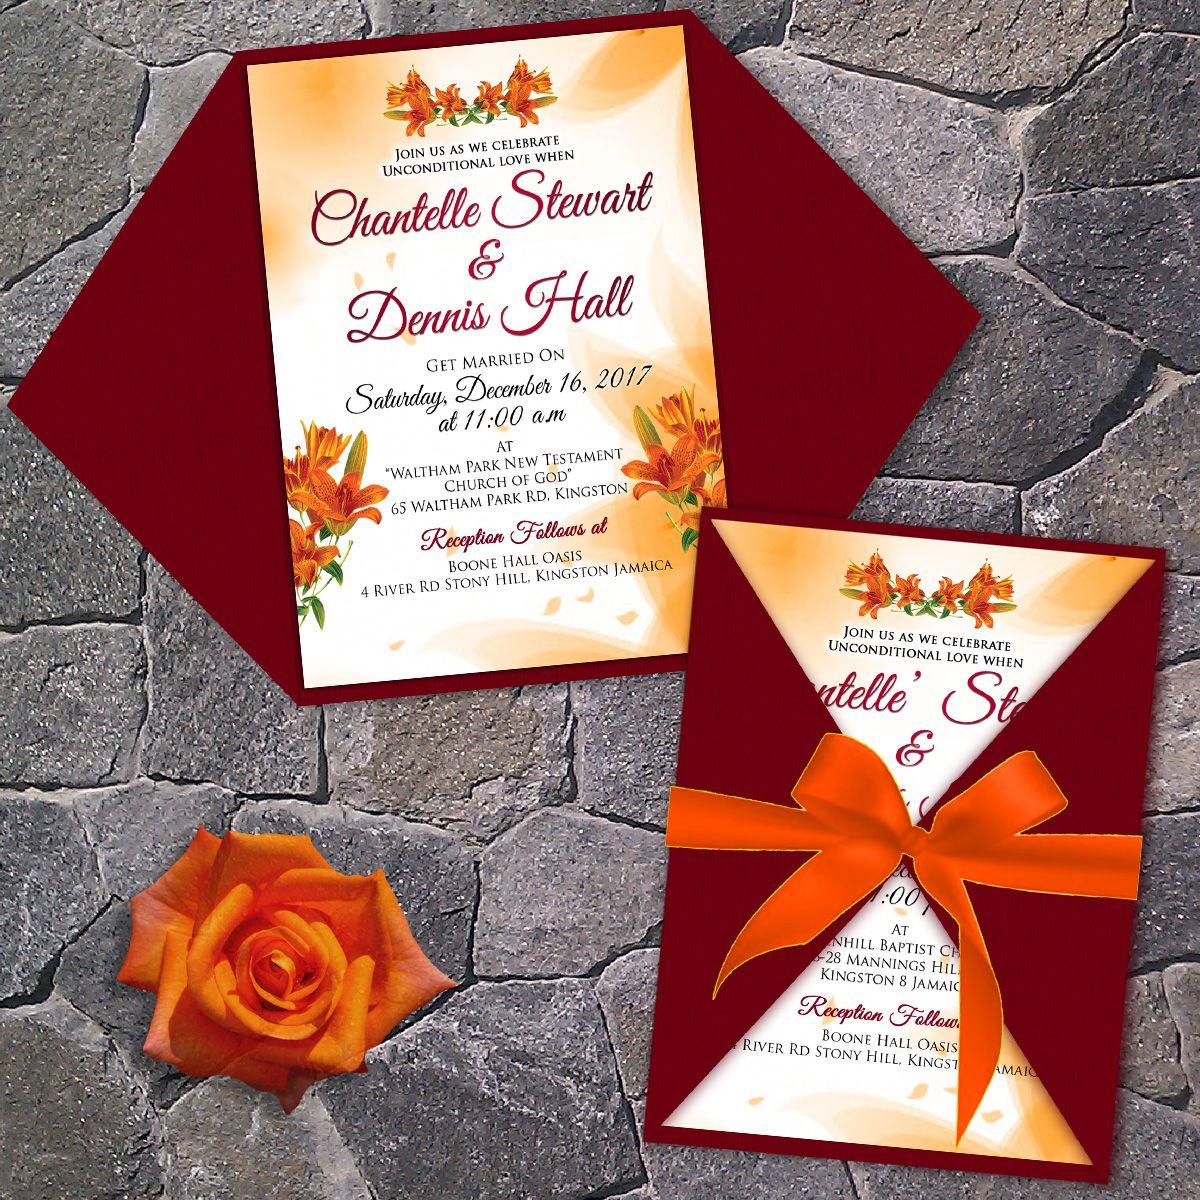 Top 100+ Wedding Invitations Best of Gated Wedding Invitation #we… | Wedding  invitations printable templates, Wooden wedding invitations, Wedding  invitations online